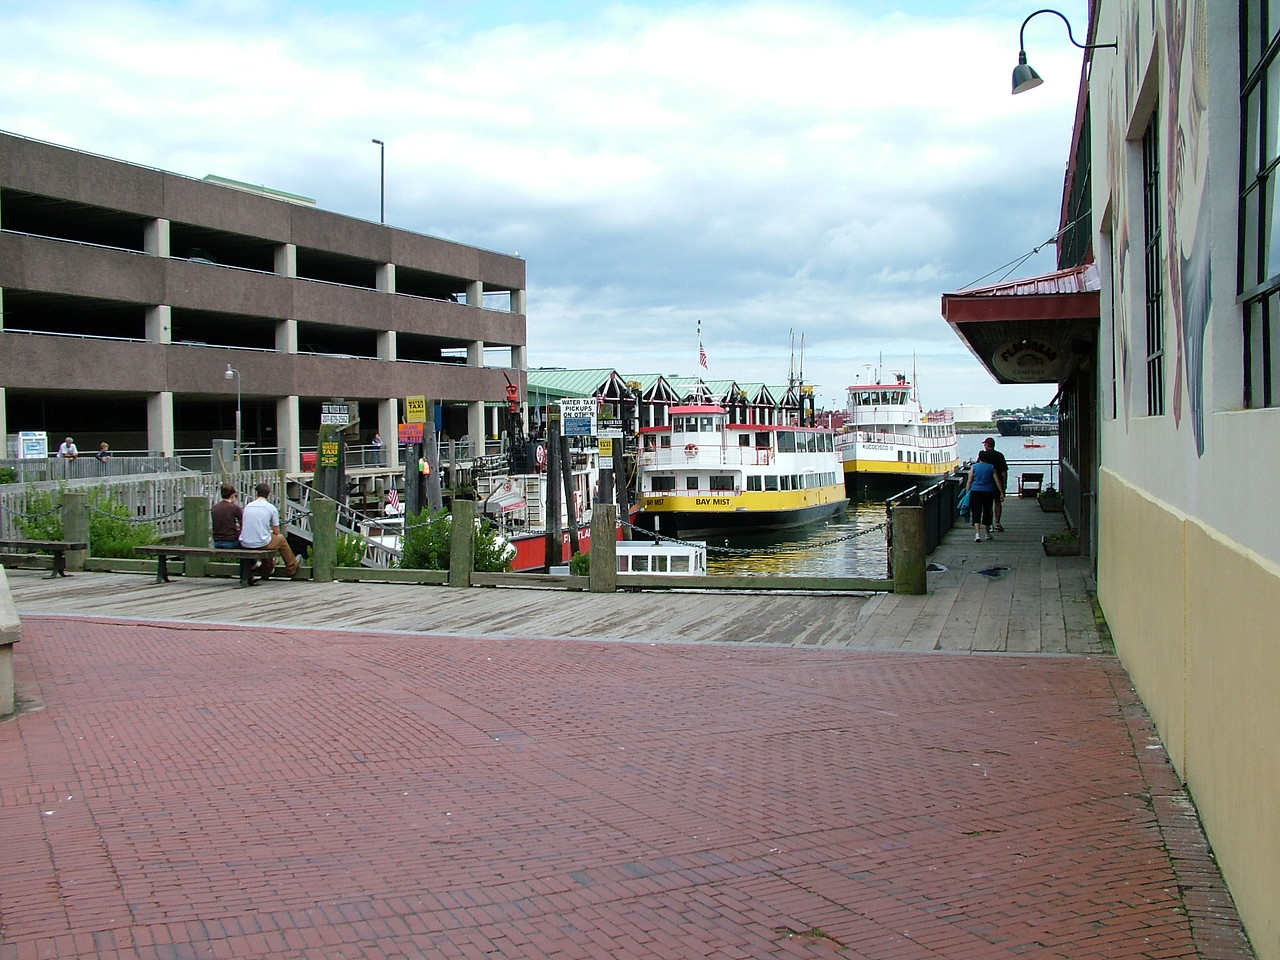 Portland - Walking around